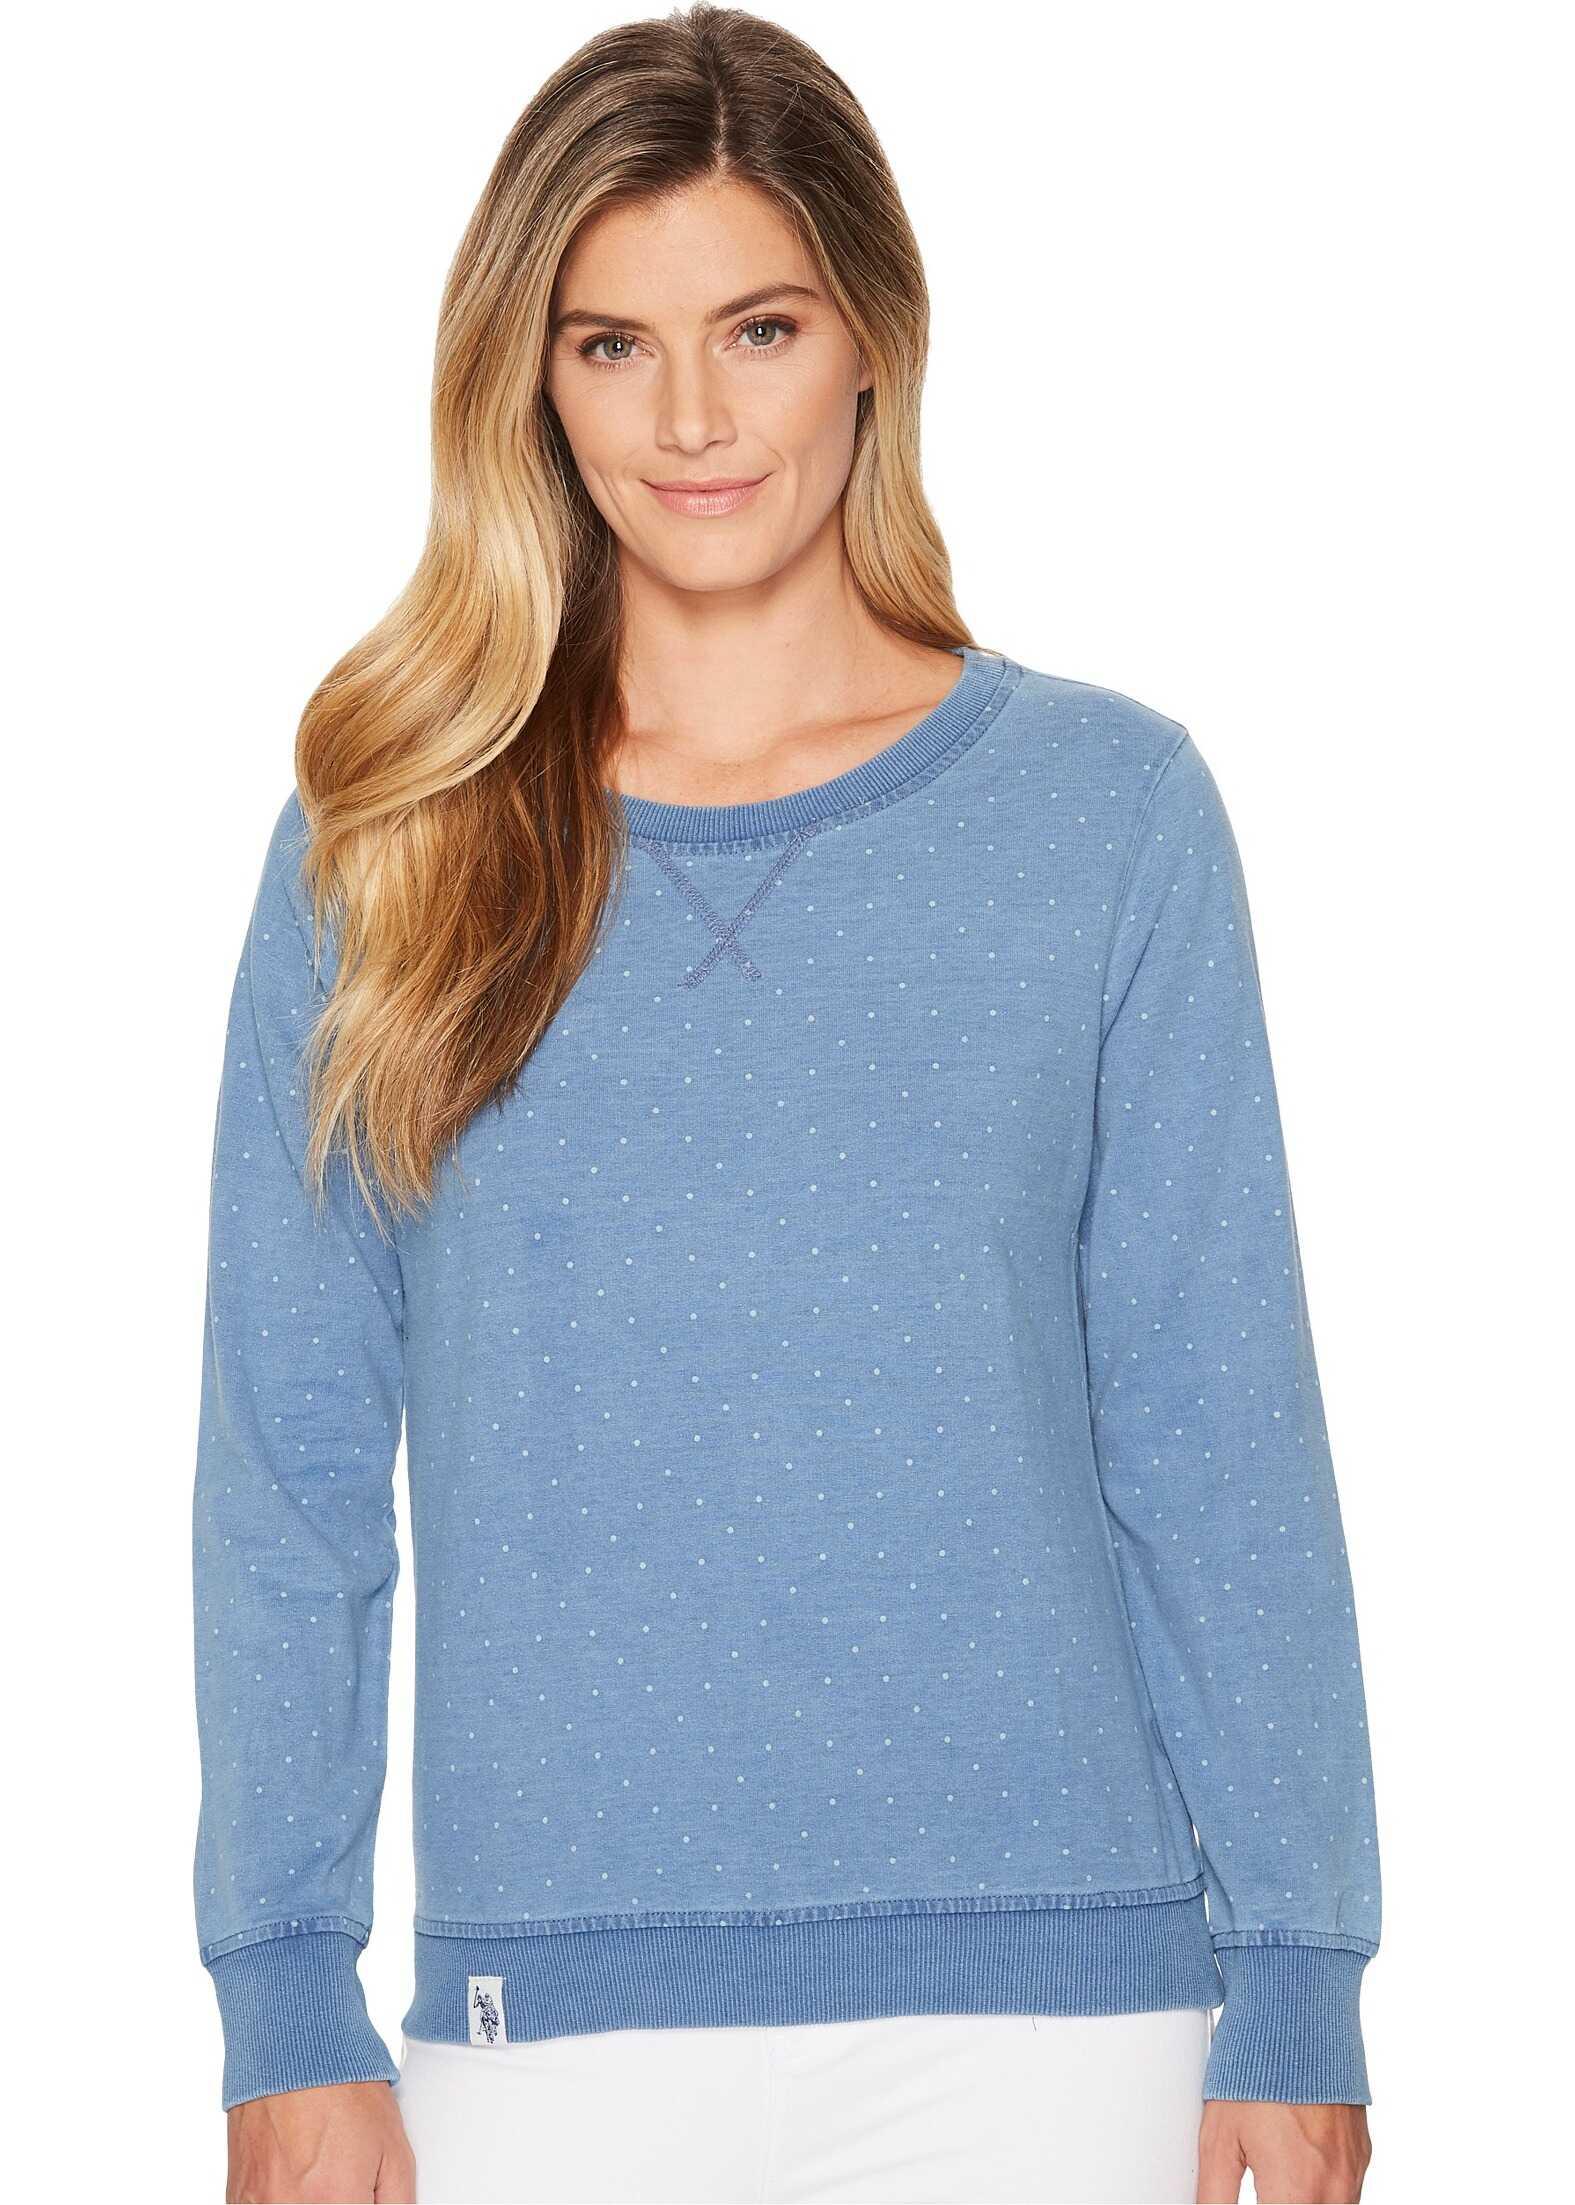 U.S. POLO ASSN. Knitted Sweatshirt Blue